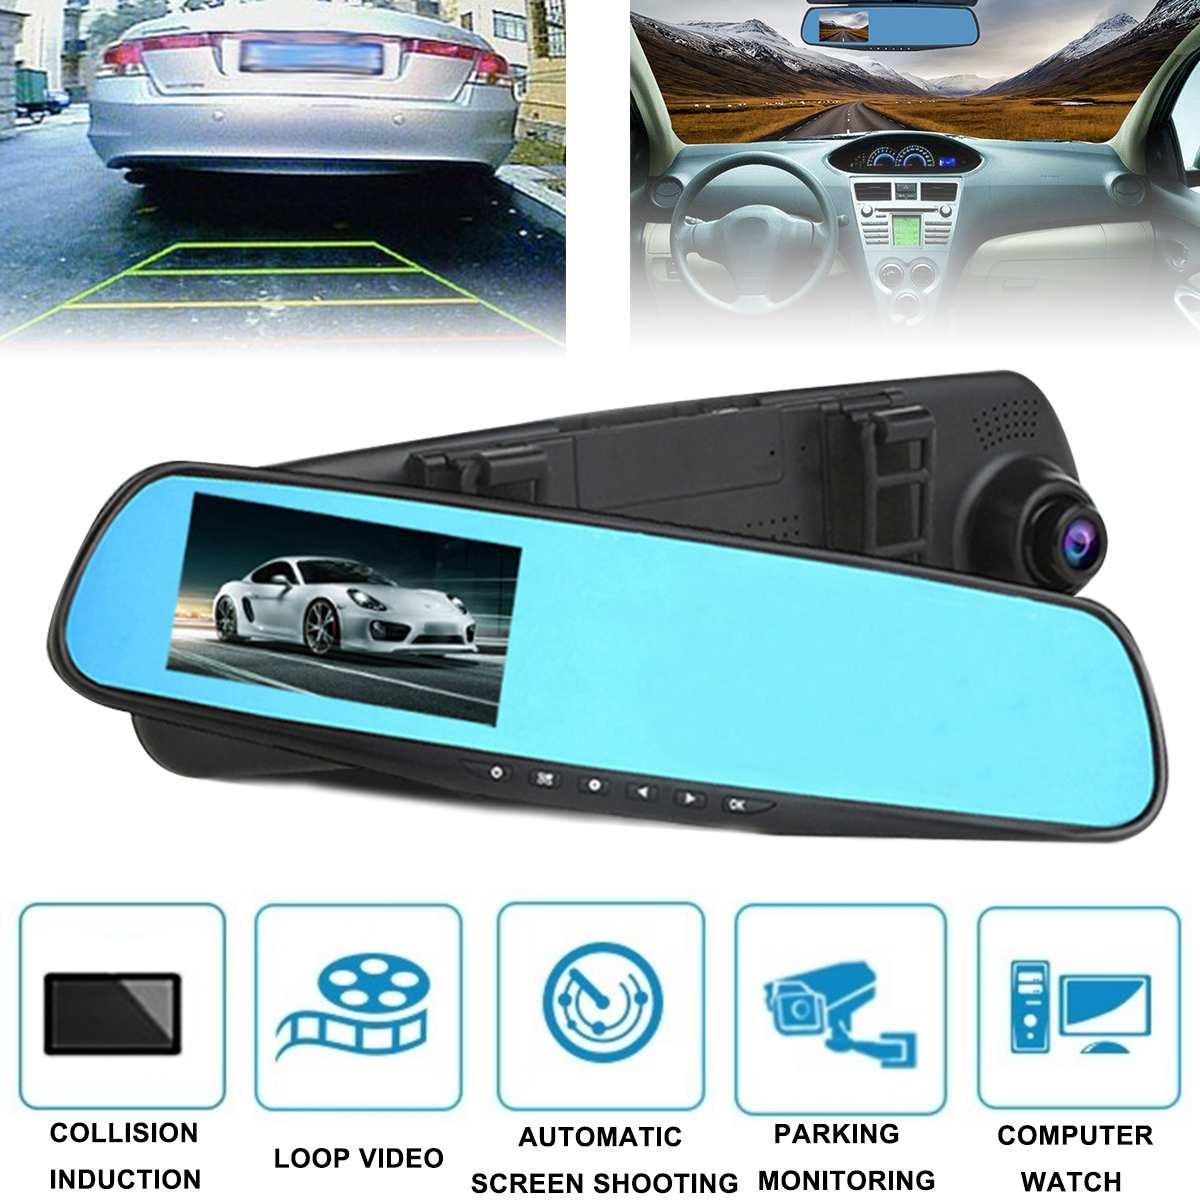 4,0 pulgadas Full HD 1080 P espejo retrovisor de coche grabadora de Video Digital Len Monitor cámara de visión nocturna de grabadora de Video la parte trasera delantera